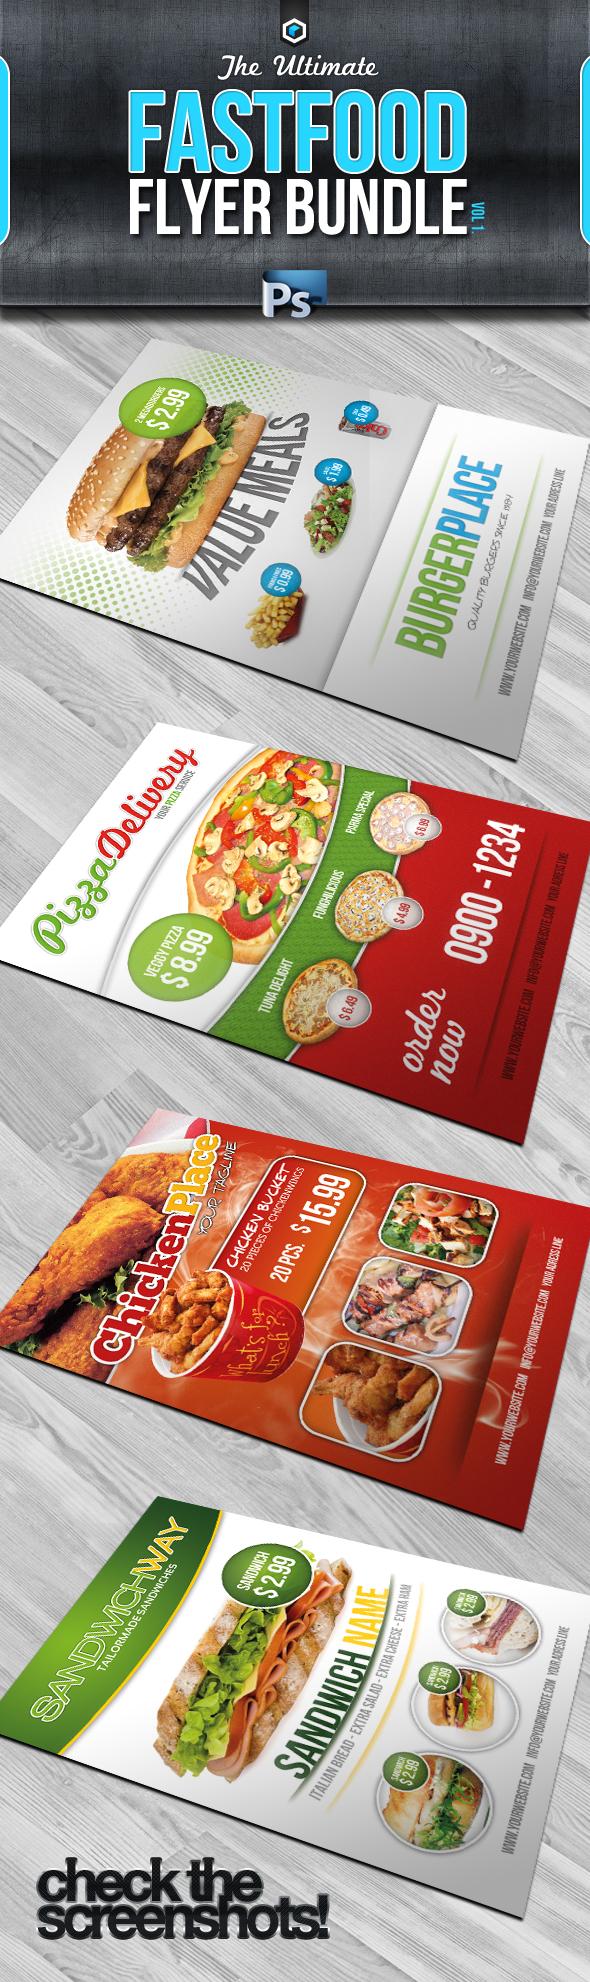 Restaurant Brochure Design Examples For Inspiration Creatives Wall